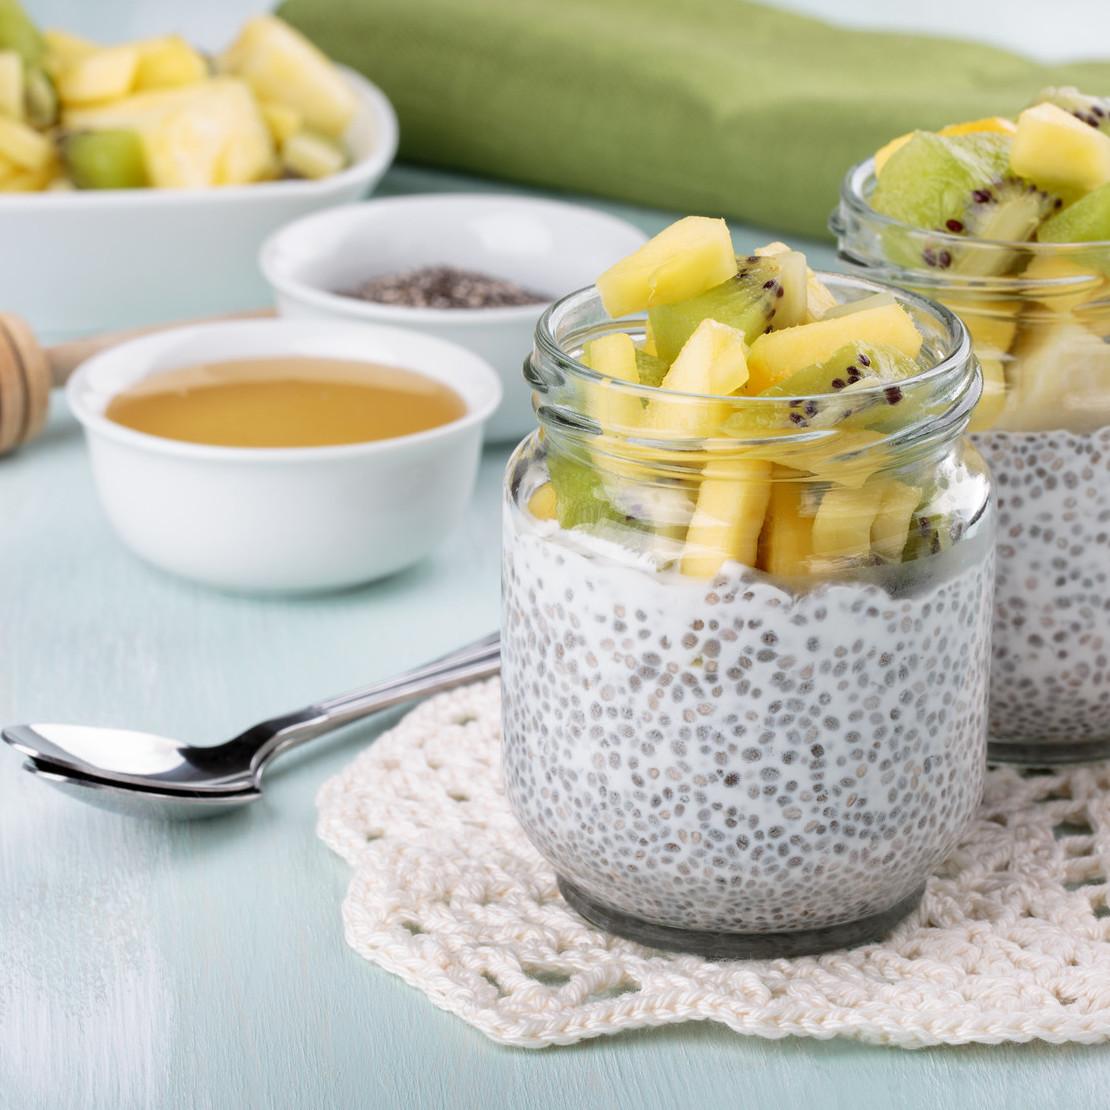 Chia pudding with Oscar® kiwi fruits